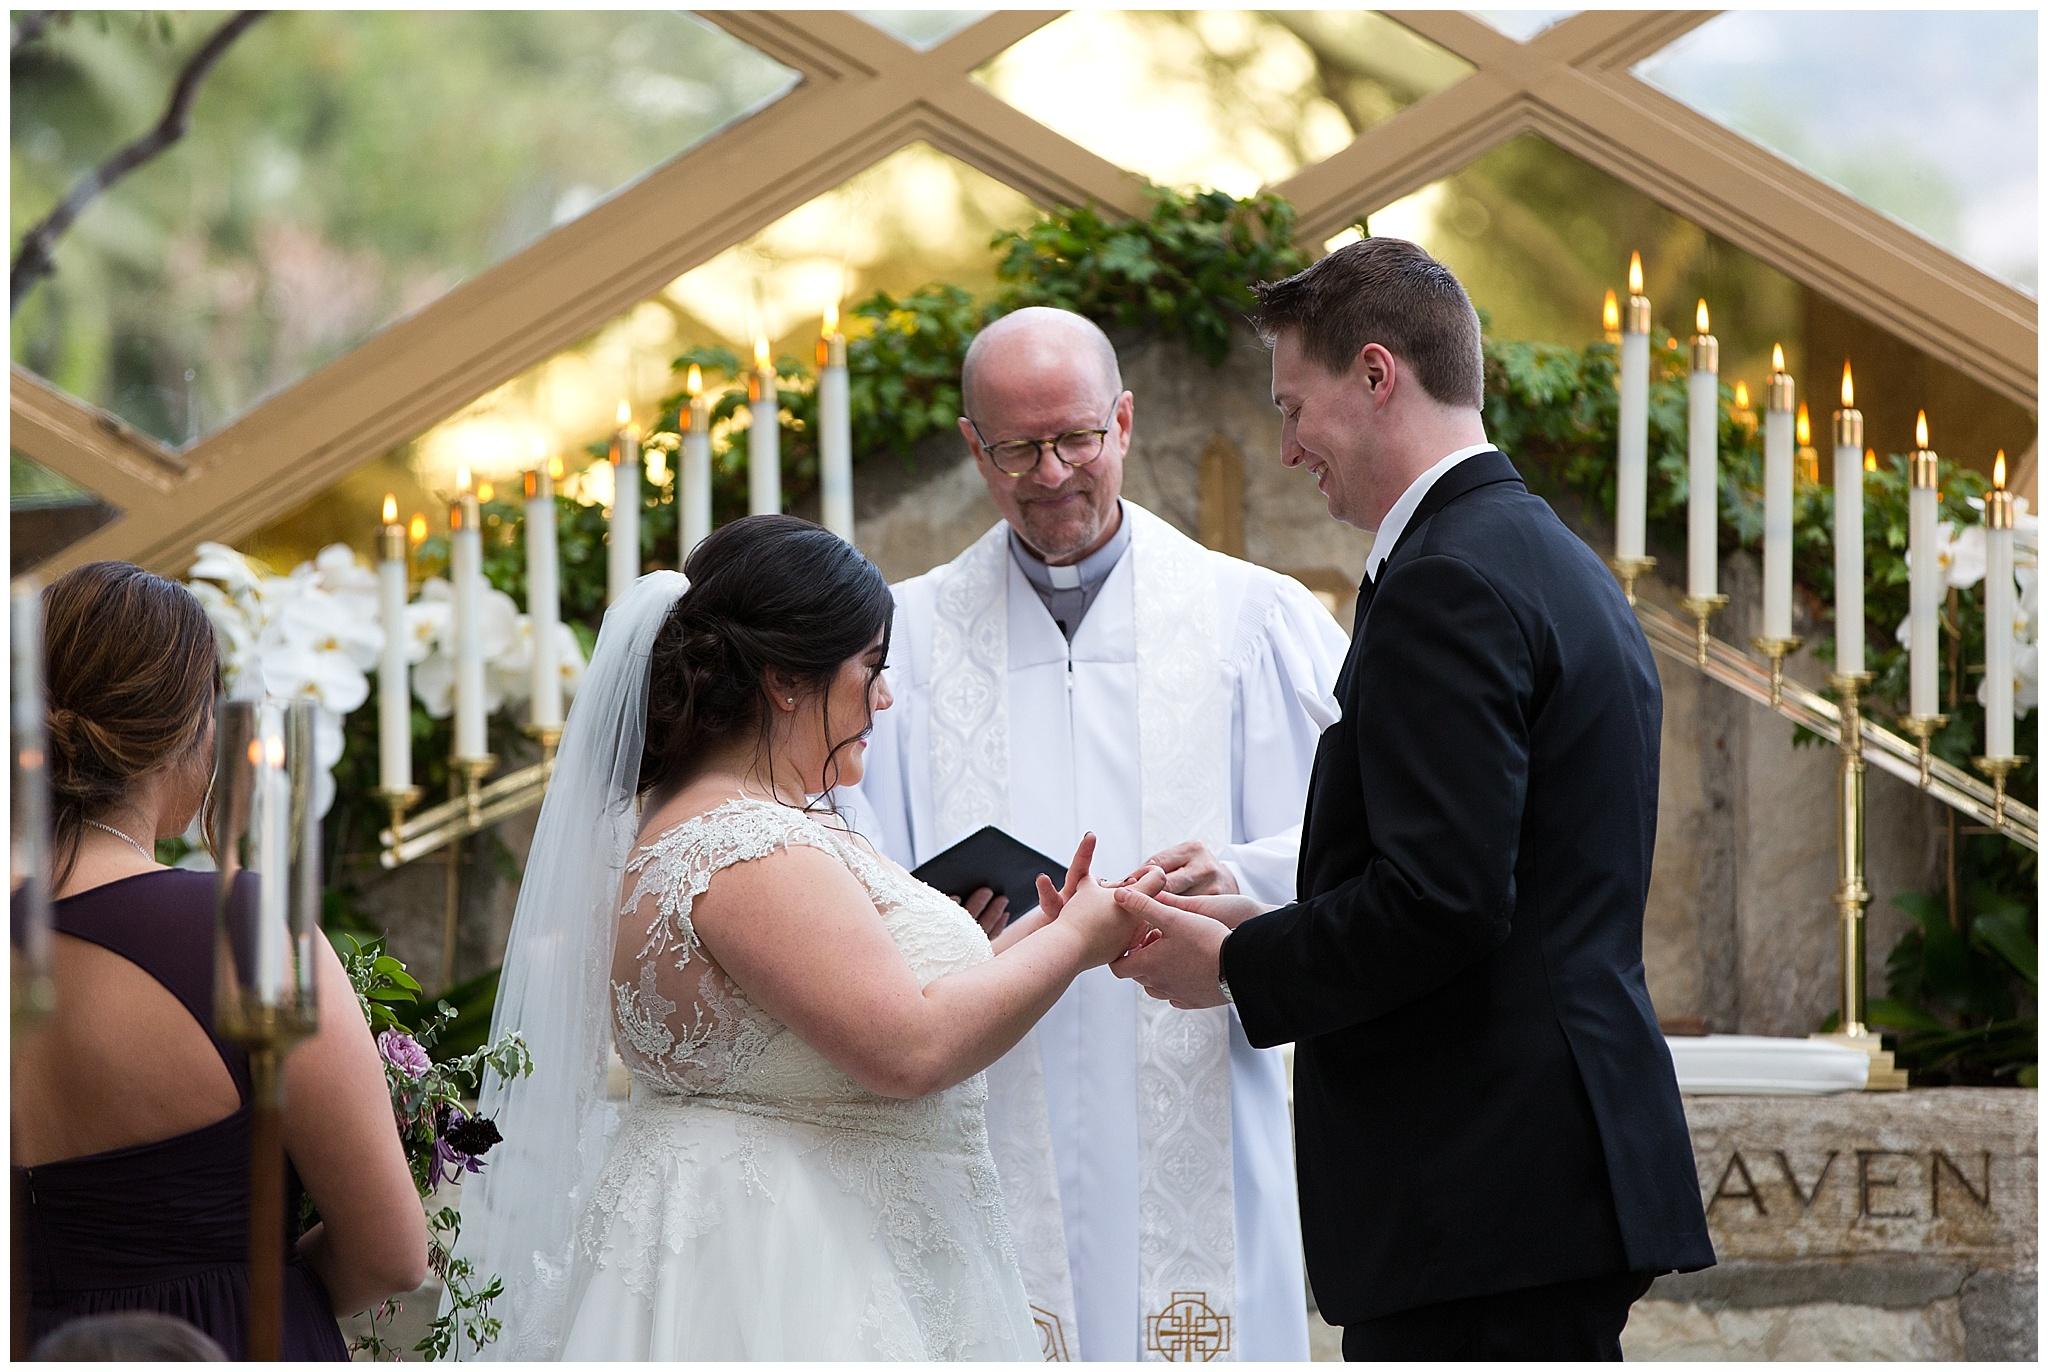 Carol_and_Grant_Wedding_3-3-18-8230.jpg